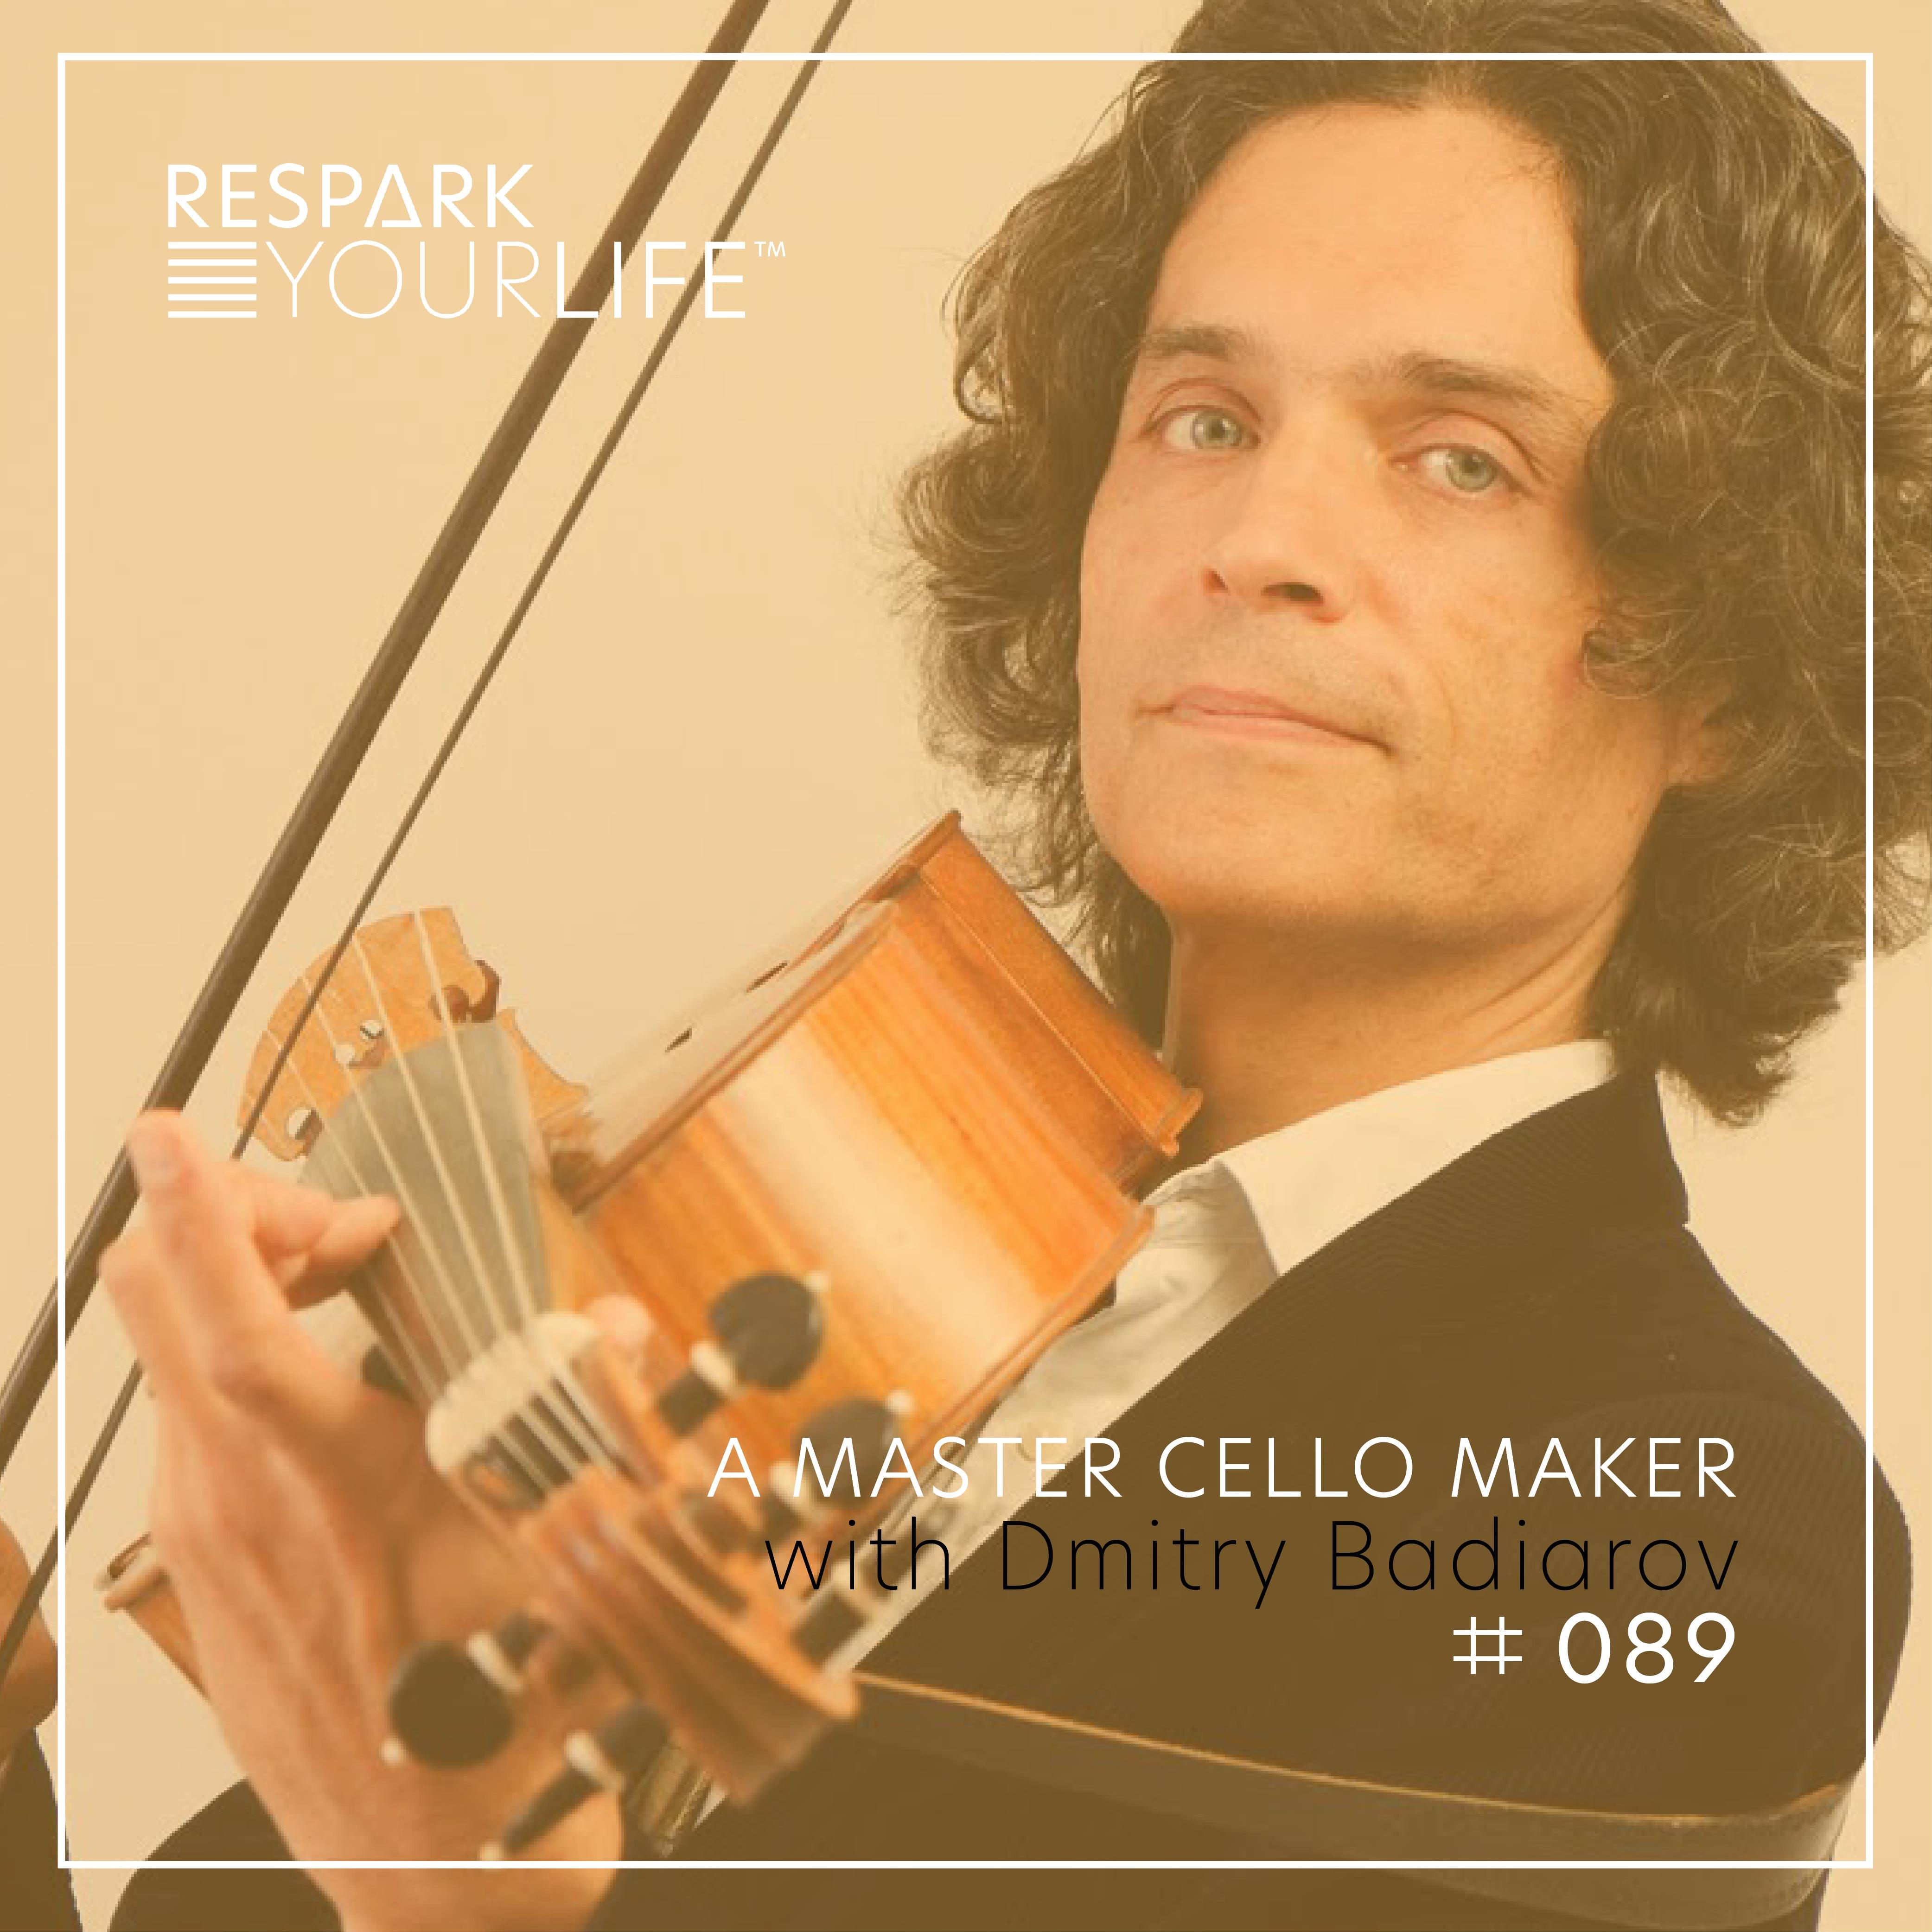 A Master Cello Maker with Dimitry Badiarov